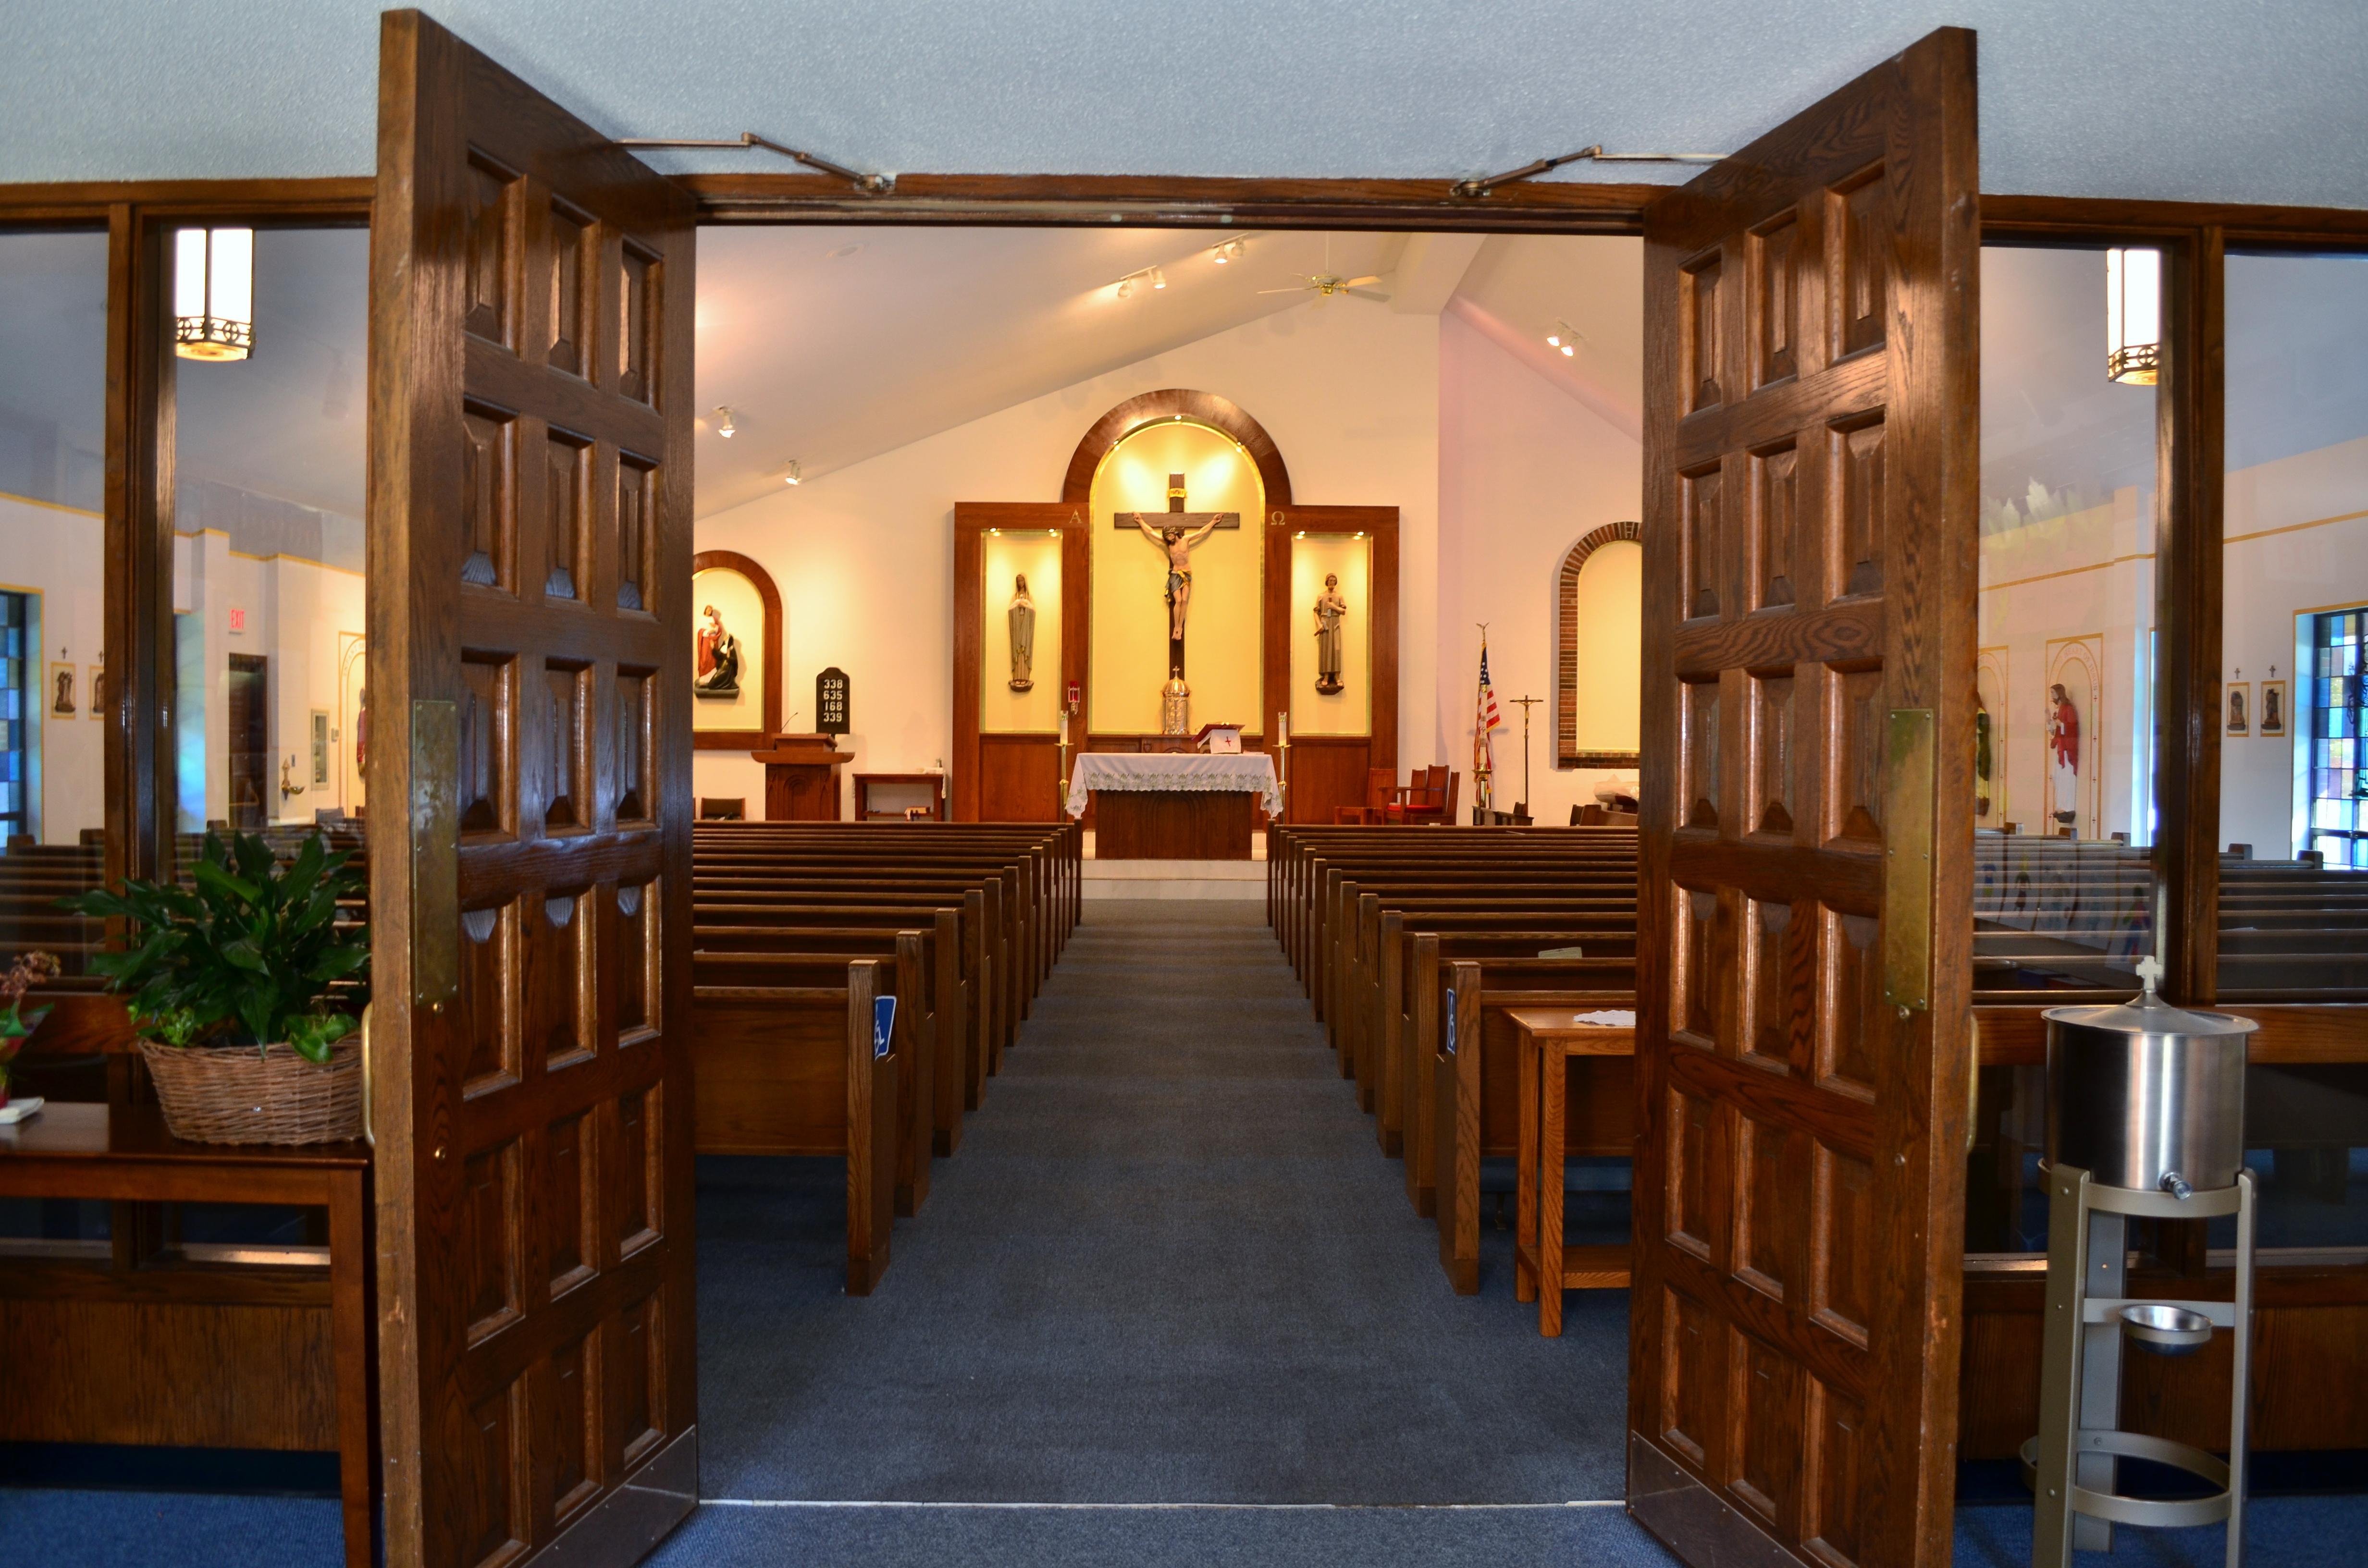 Interior of Saint Margaret Mary Church, Shelton